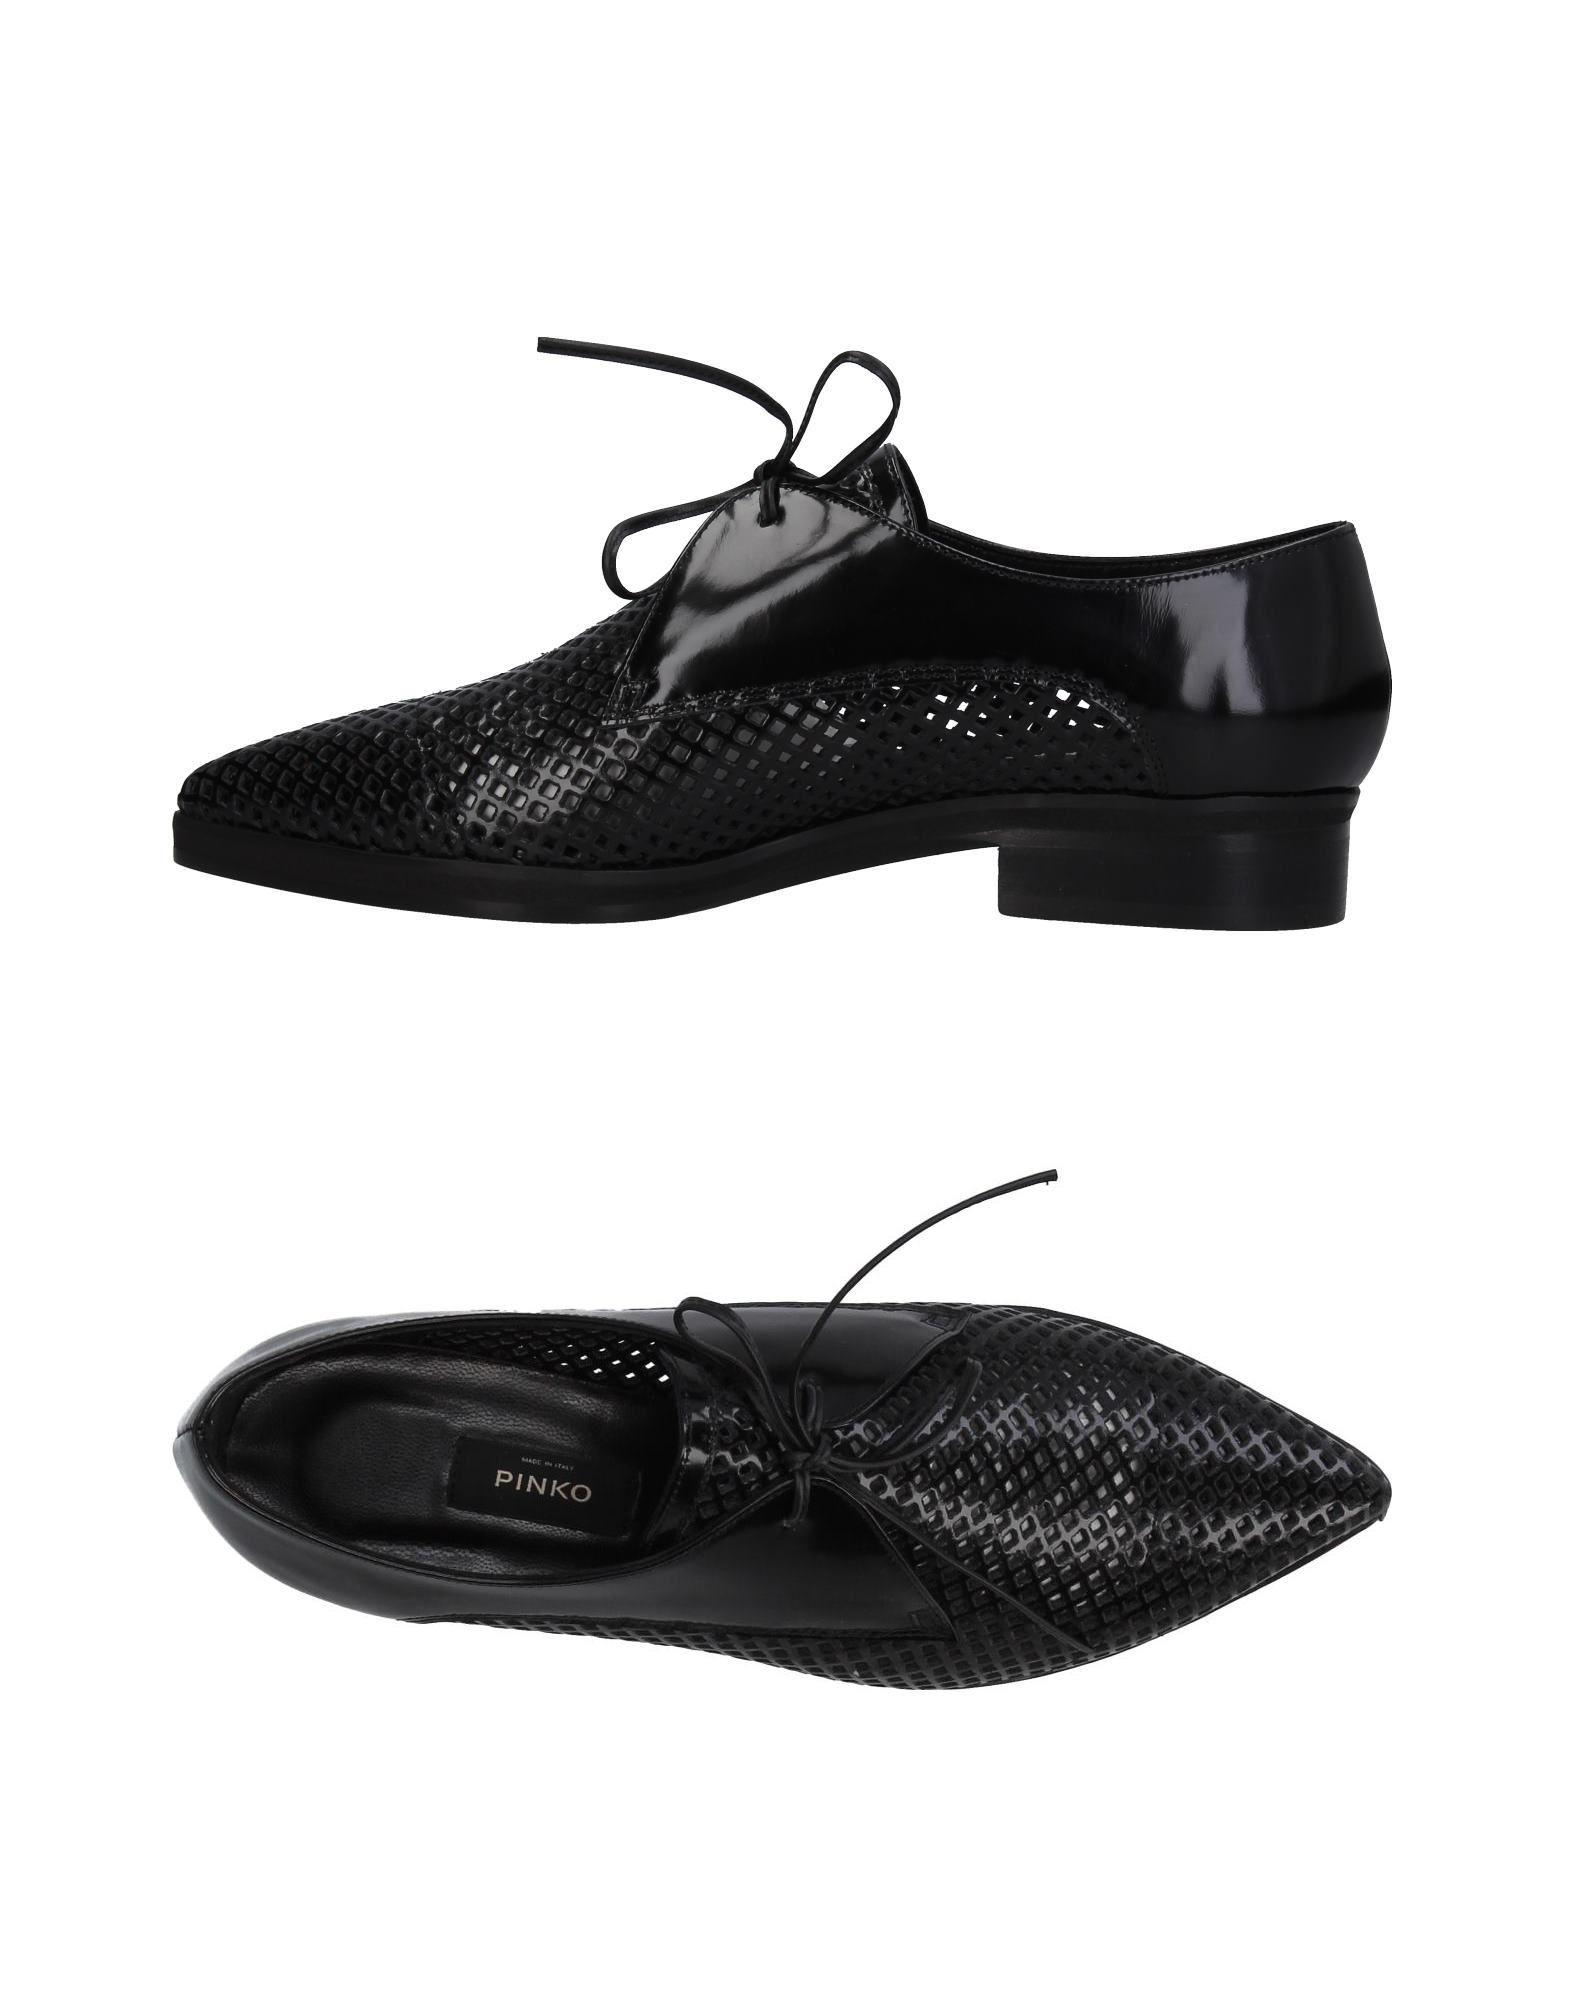 Pinko Schnürschuhe Damen  11373827NV Gute Qualität beliebte Schuhe